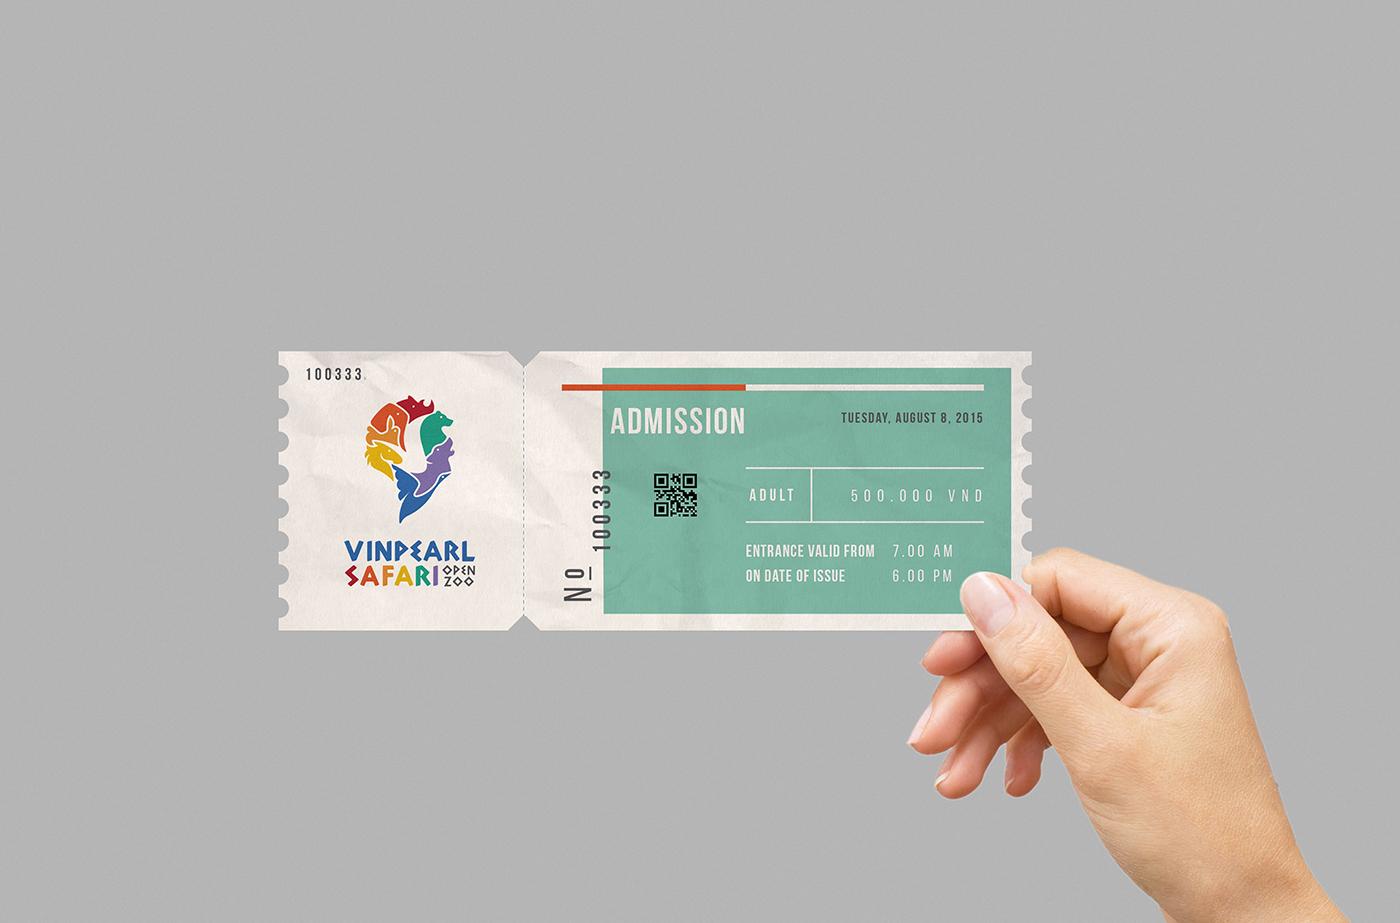 ticket-vinpearl safari-vuon thu mo-bratus-vingroup-branding agency vietnam